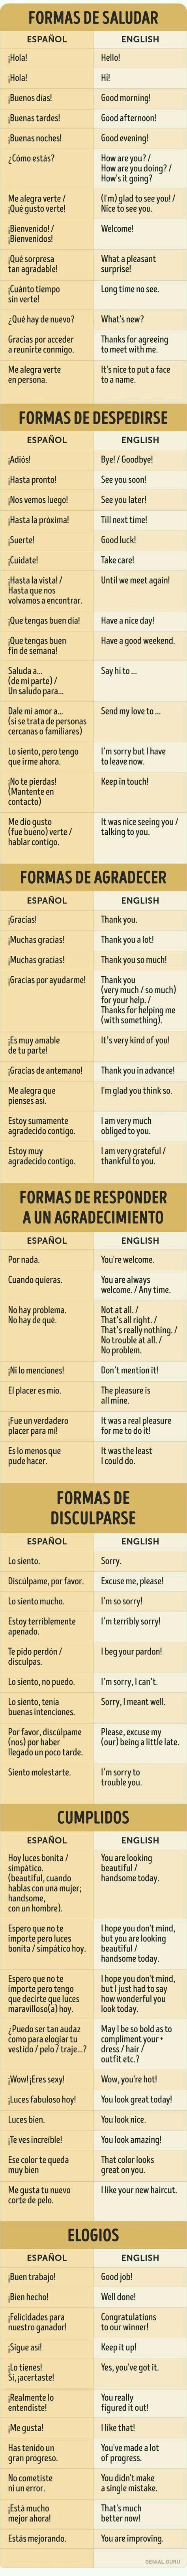 Spanish phrases and greetings game 6710157 salonurodyfo free awardwinning online coursespanish game printable cootiecatchers spanish playground m4hsunfo